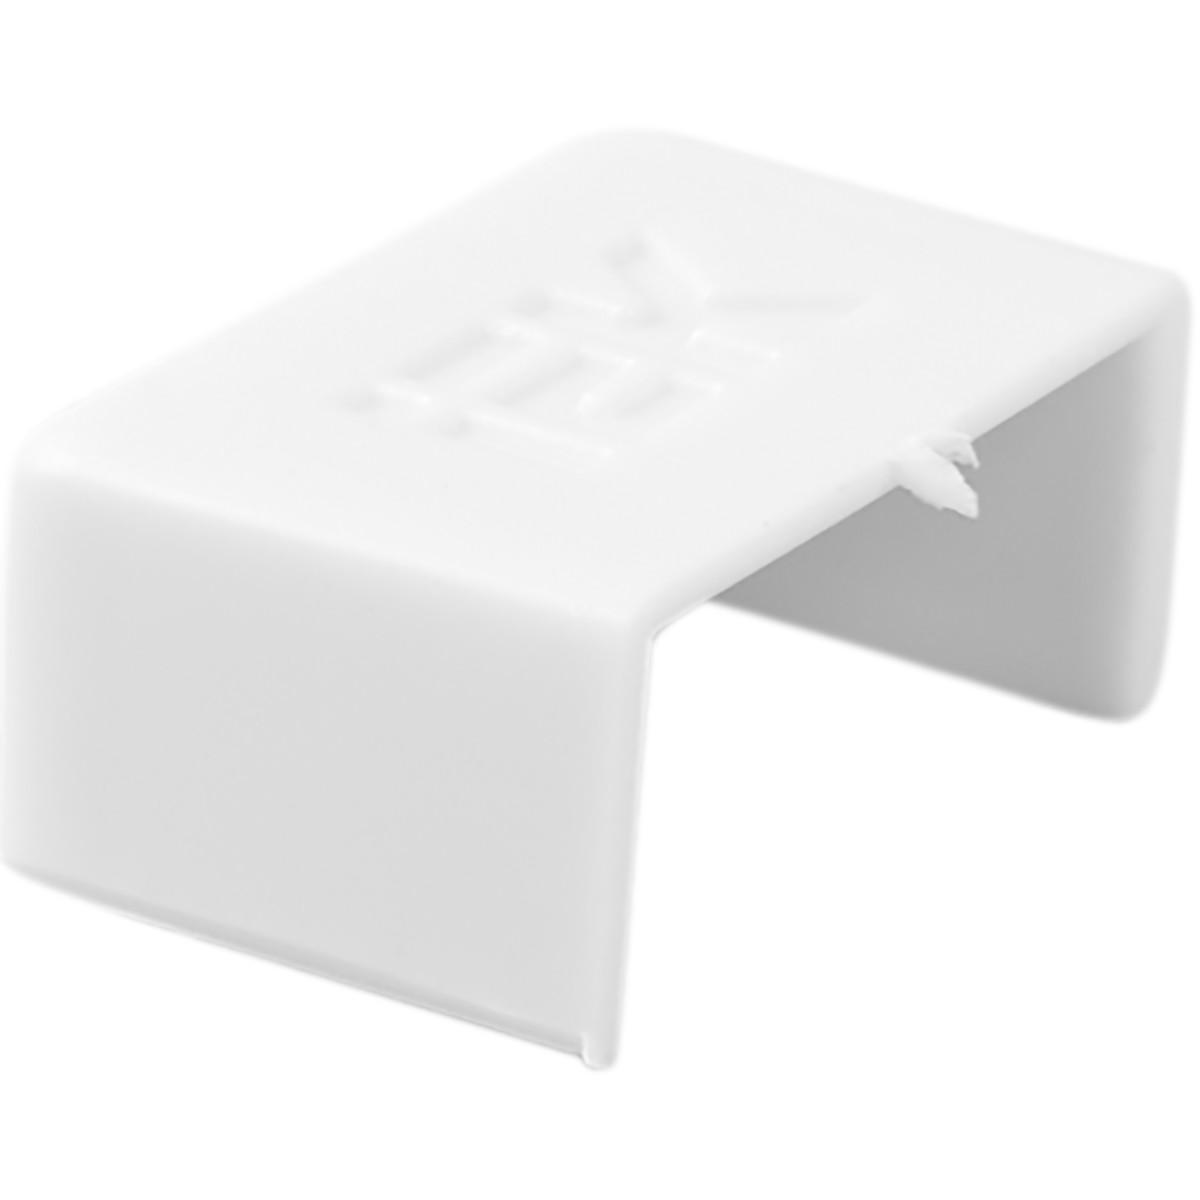 Заглушка IEK КМЗ 15/10 мм цвет белый 4 шт.